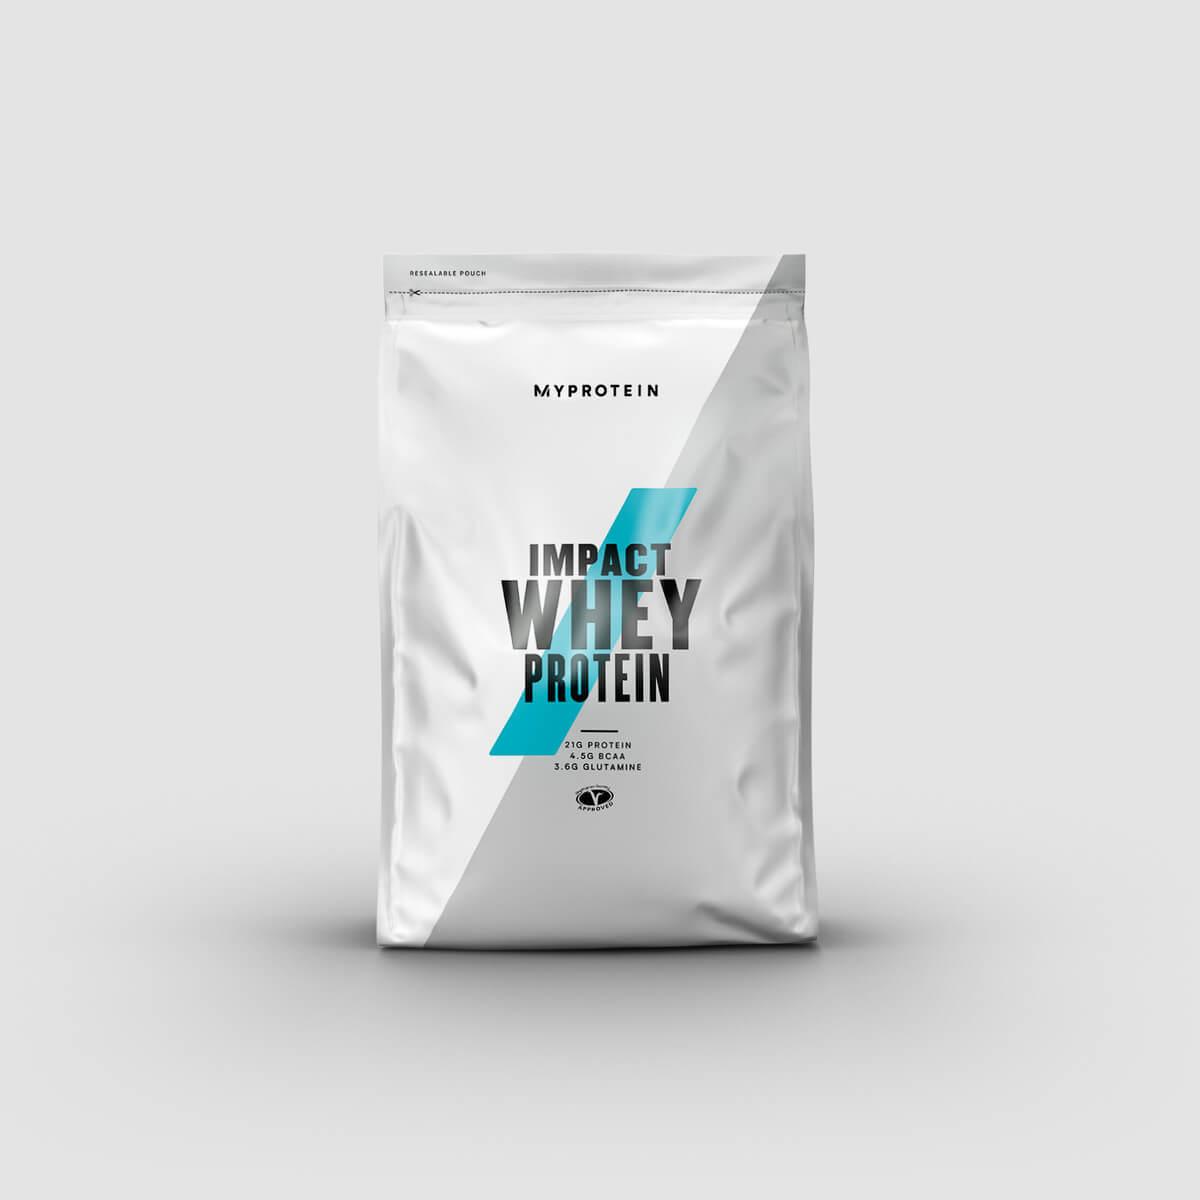 Myprotein Impact Whey Protein - 1kg - Noix De Coco